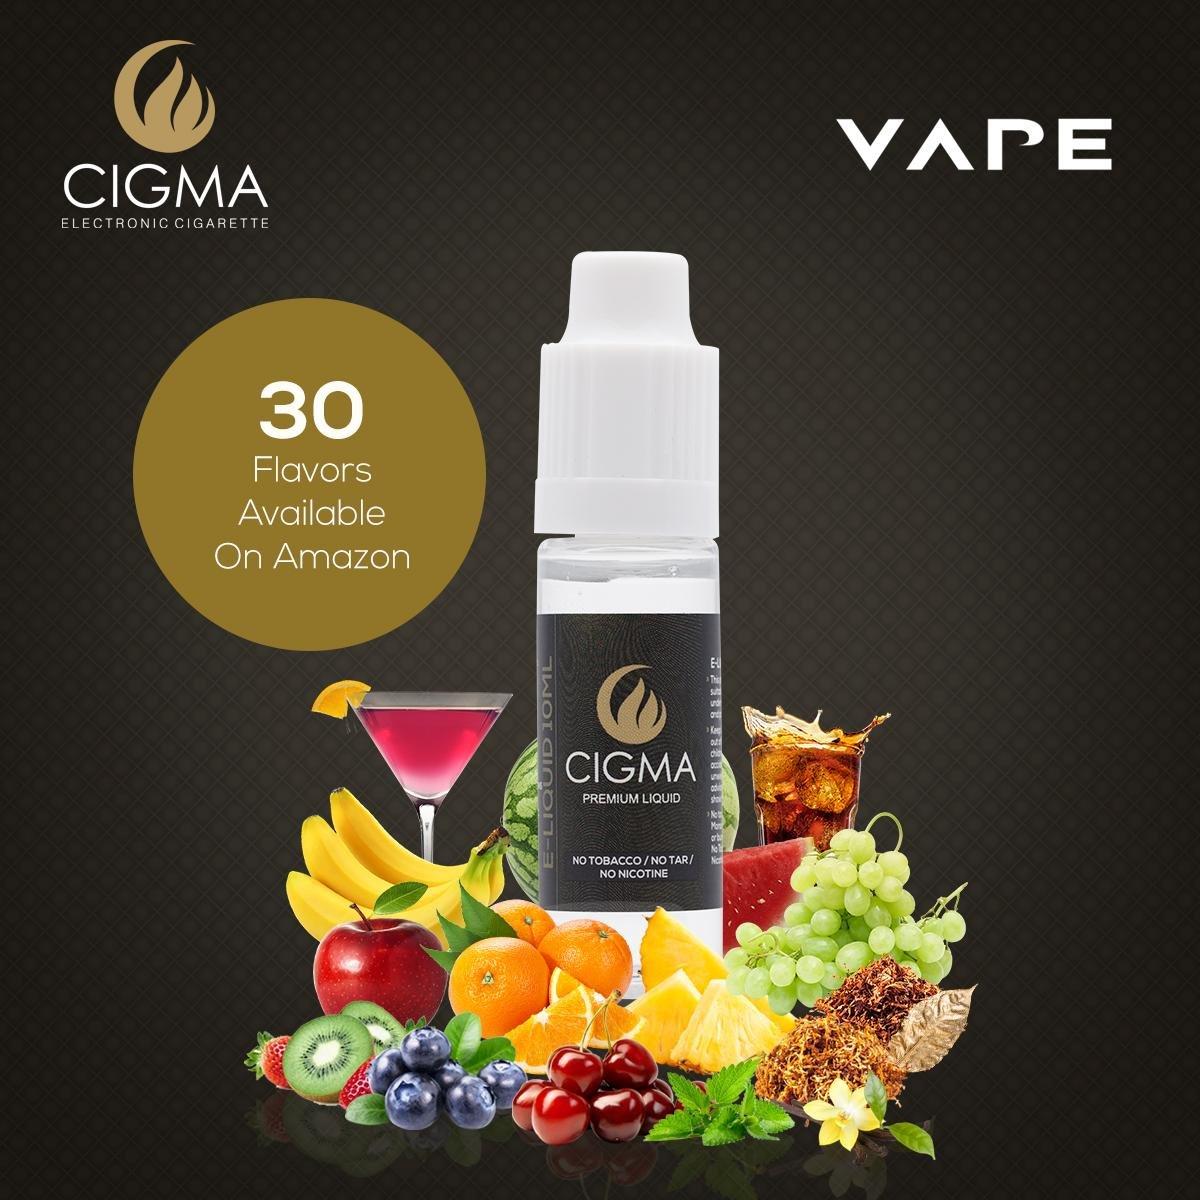 Cigma 5 X 10ml E Liquid Sweet Mix New Flavours Bubble Gum Tutti Og Milk Tea Max Vg Usa Premium Eliquid Frutti Lemon Soda Butterscotch Cola Quality Formula With Only High Grade